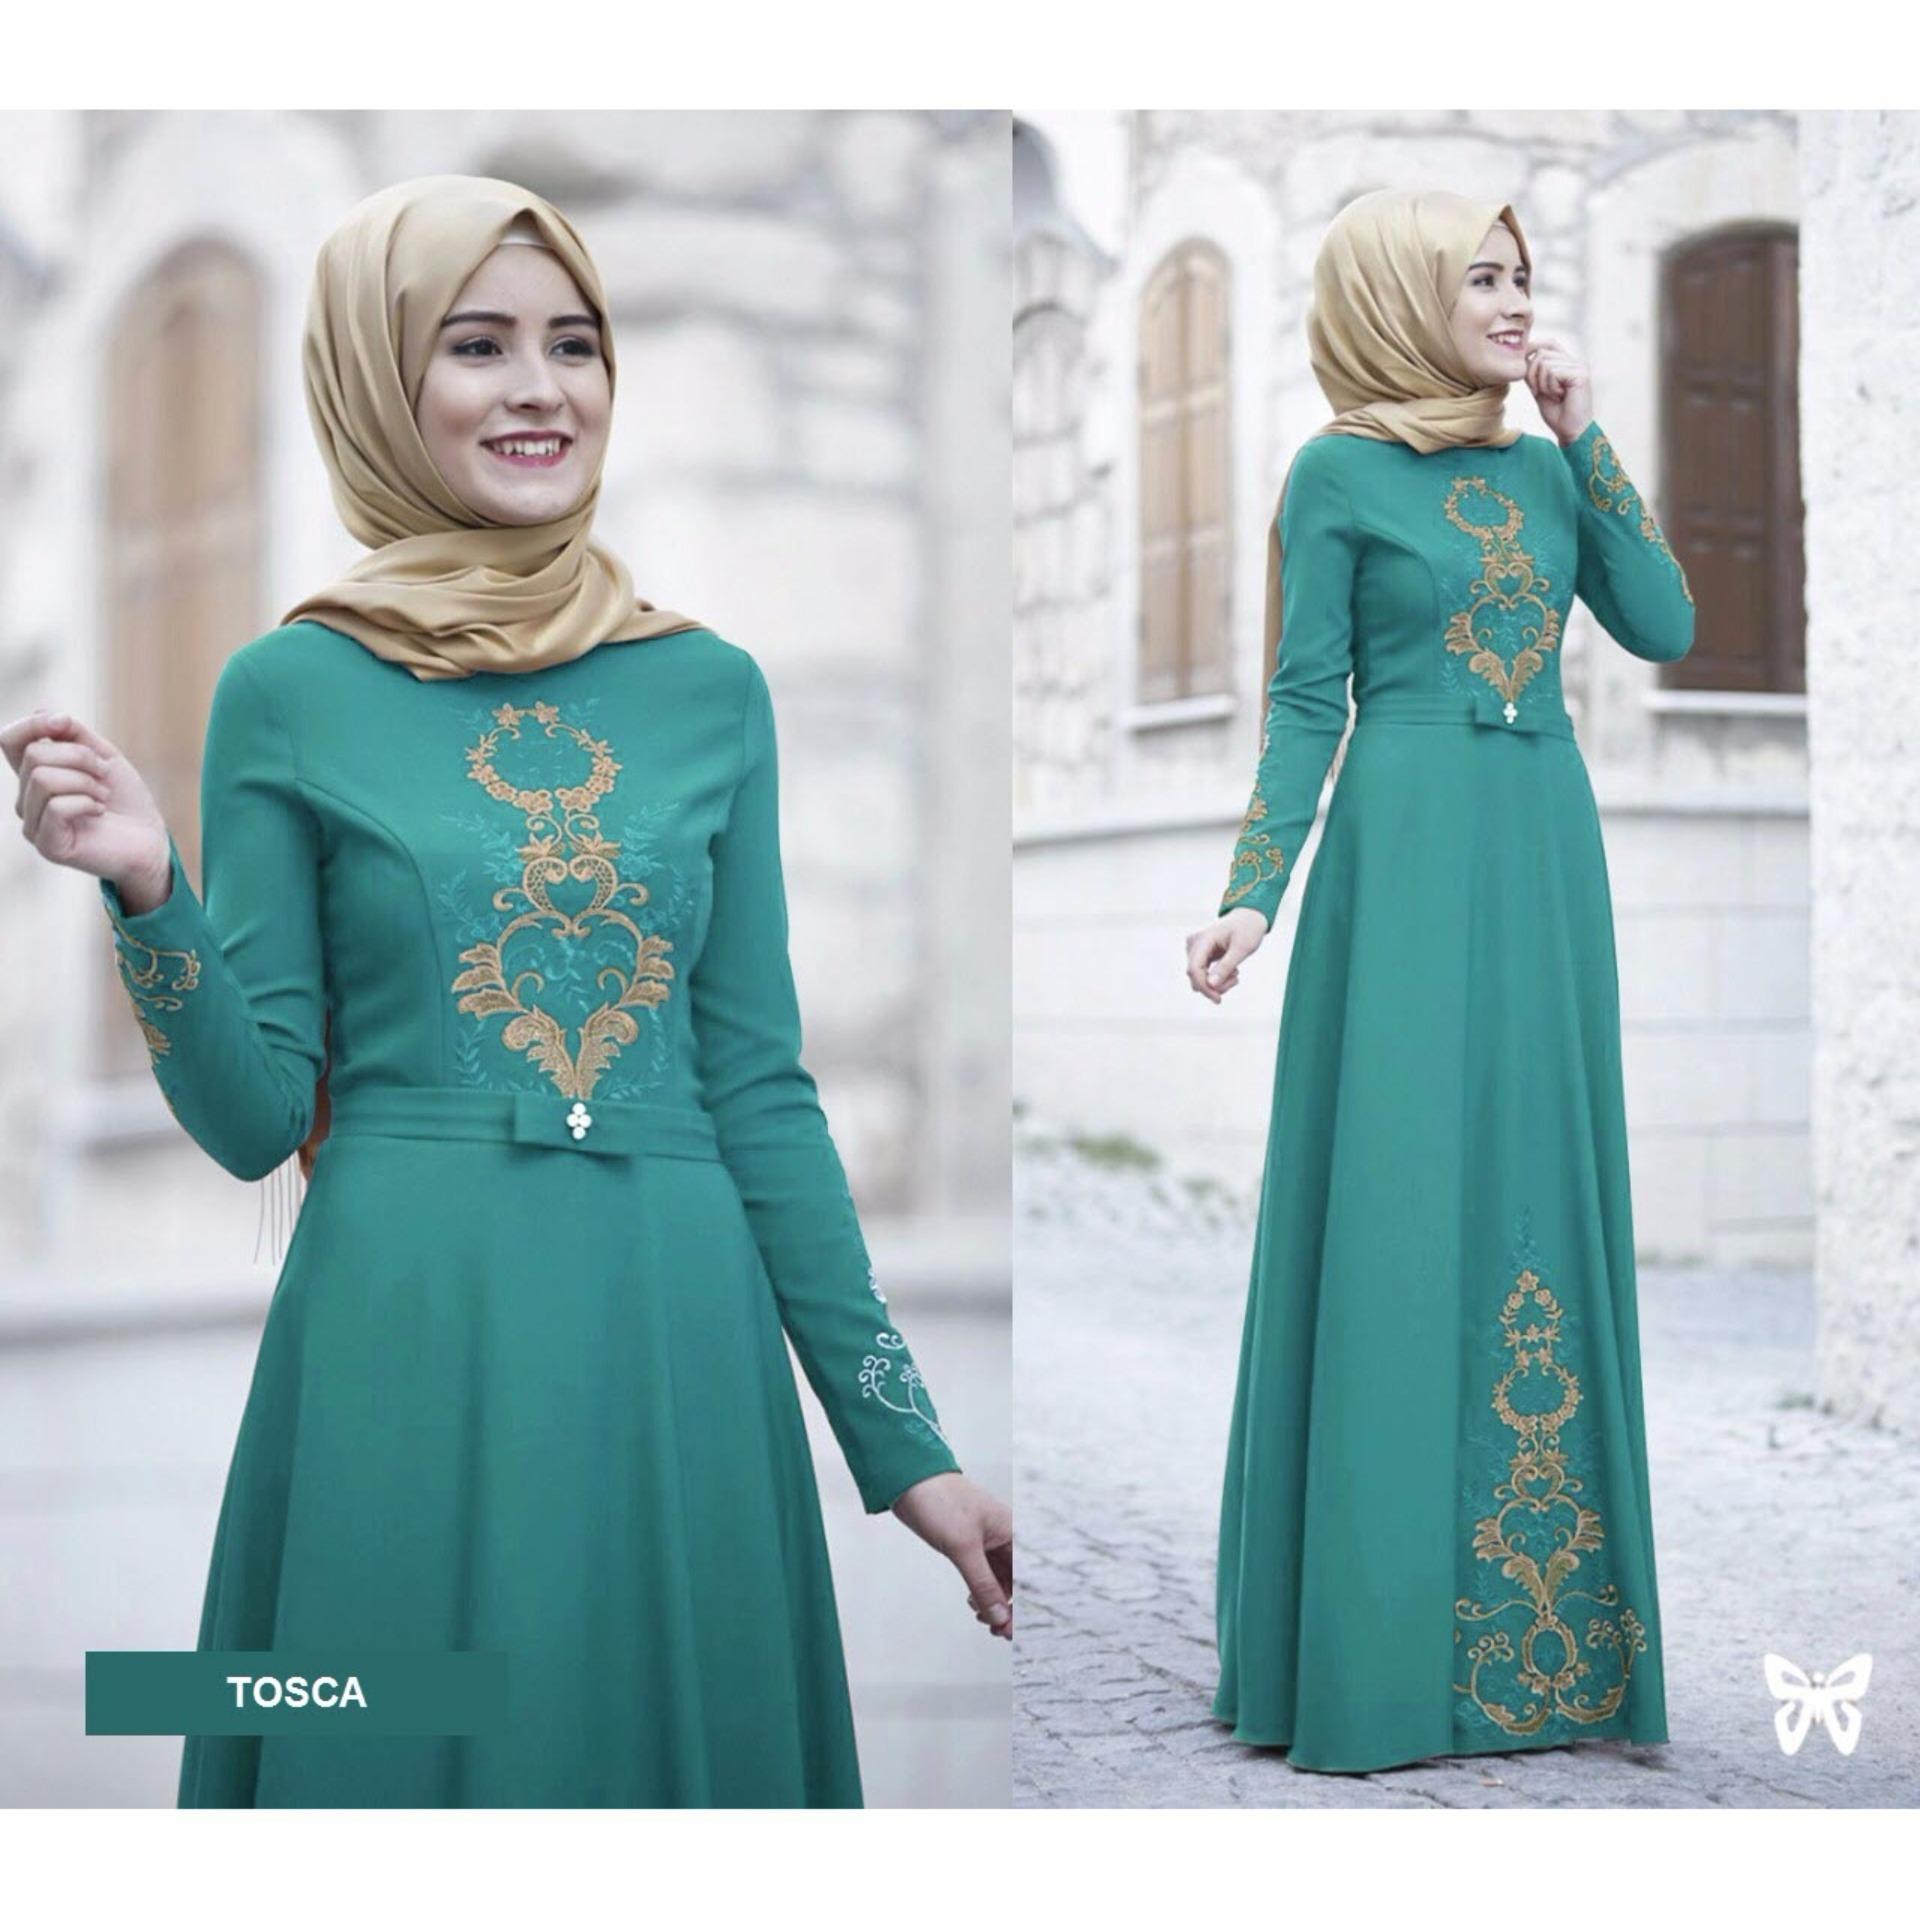 Maxi Dress Lengan Panjang Motif Bordir MSR070 / Gamis Syari / Gaun Pesta Muslimah / Baju Muslim Wanita Syar'i / Hijab / Srravena